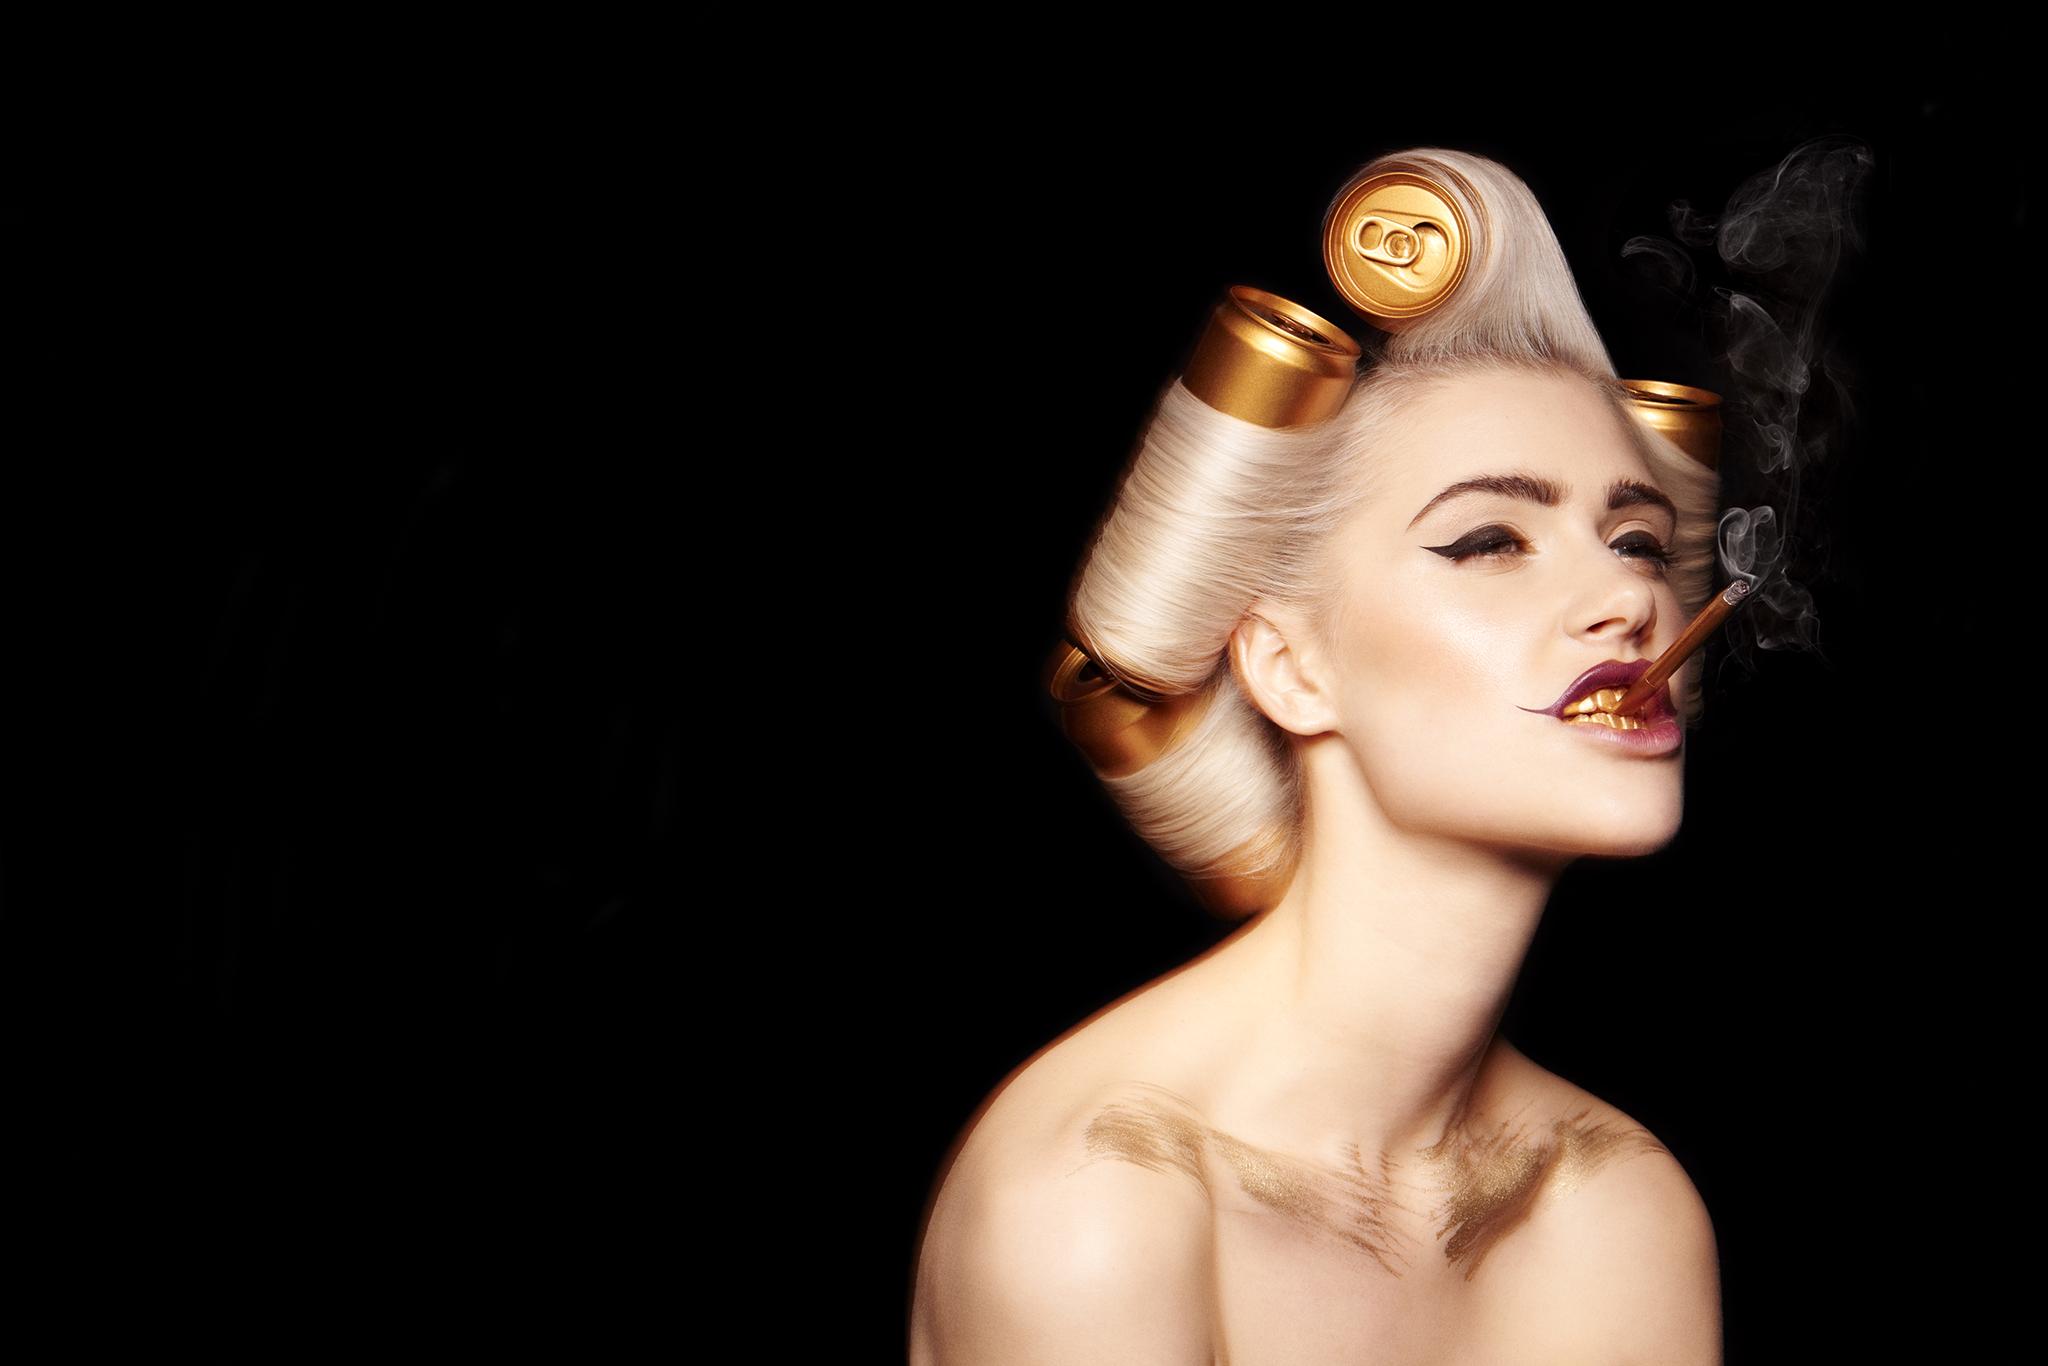 Jeremy Esteve⎥Paris based beauty & fashion photographer